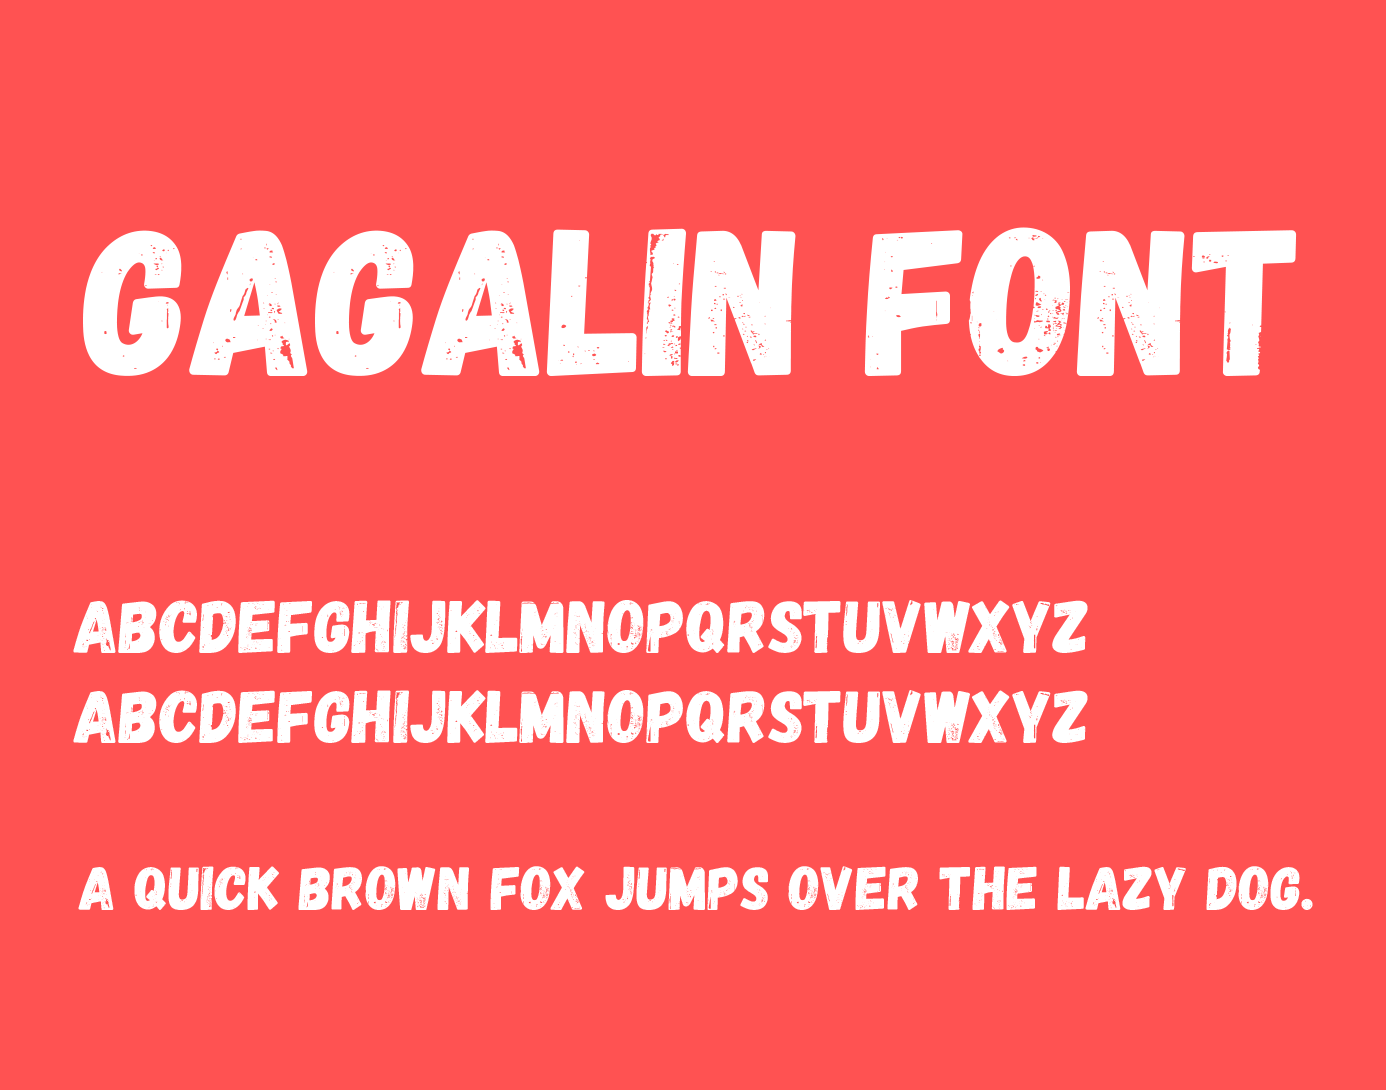 https://fontclarity.com/wp-content/uploads/2019/09/gagalin-font-download-0.png Free Download